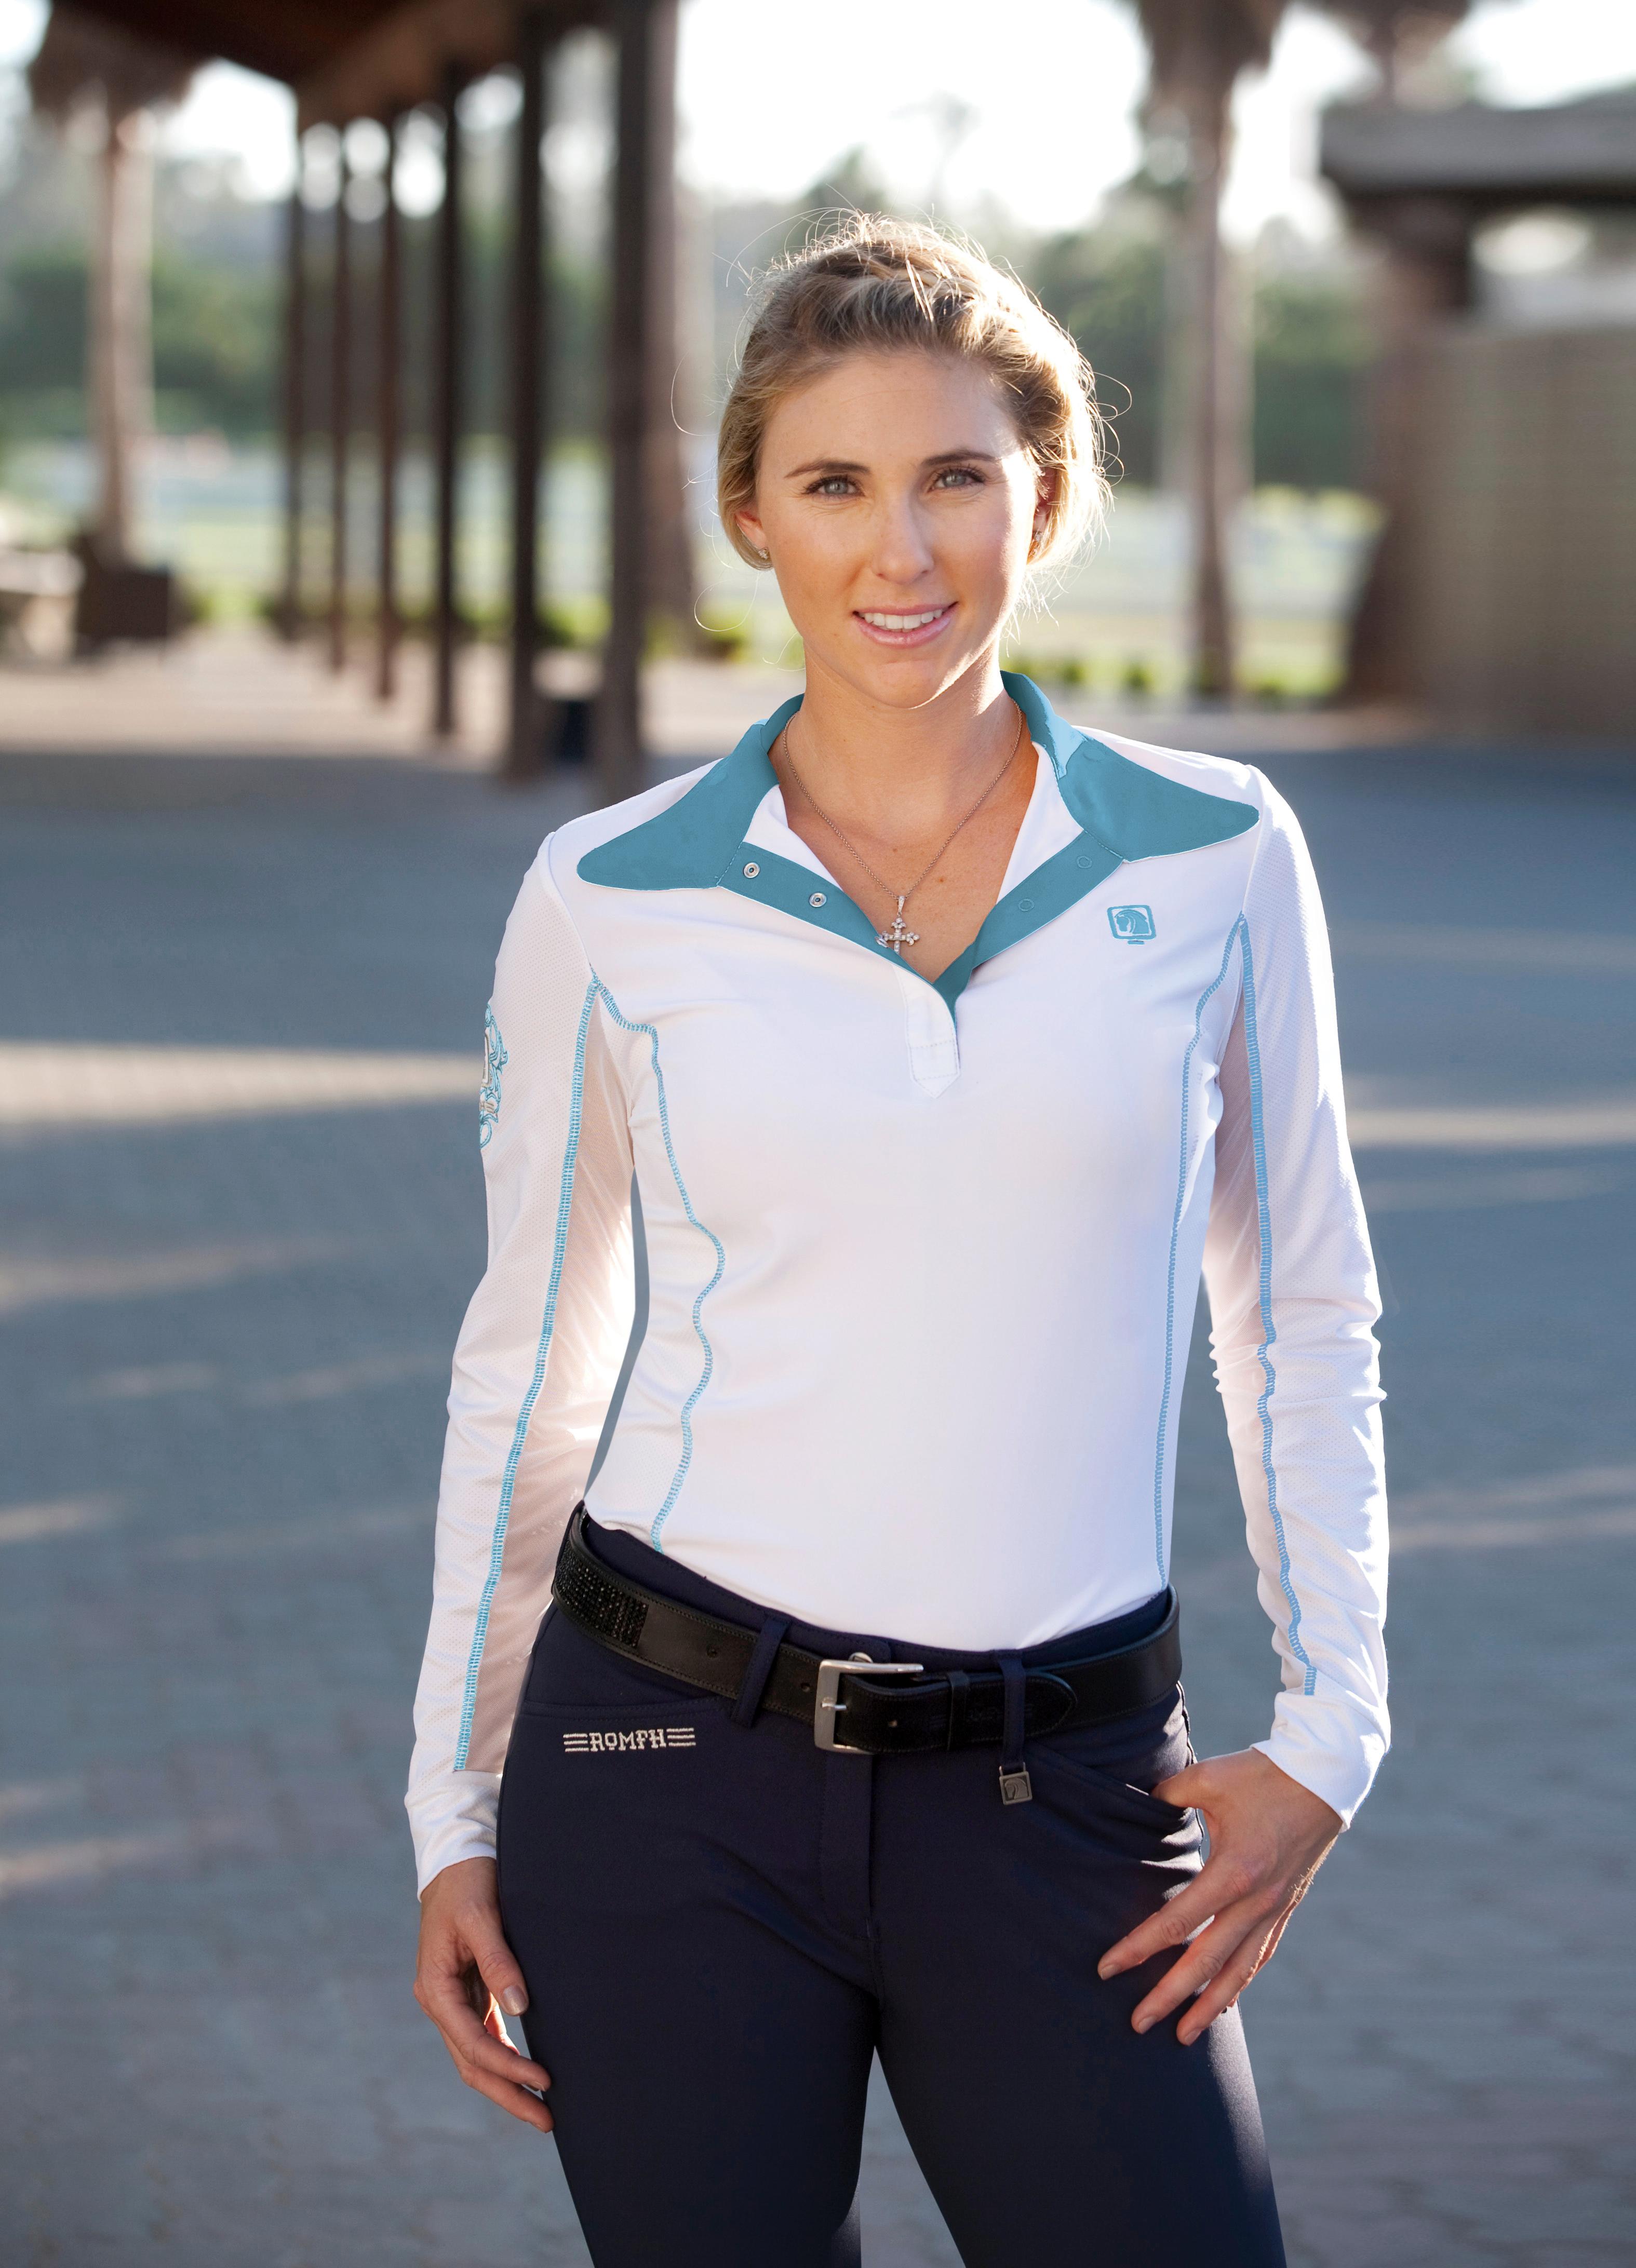 Romfh Competitor Long Sleeve Show Shirt